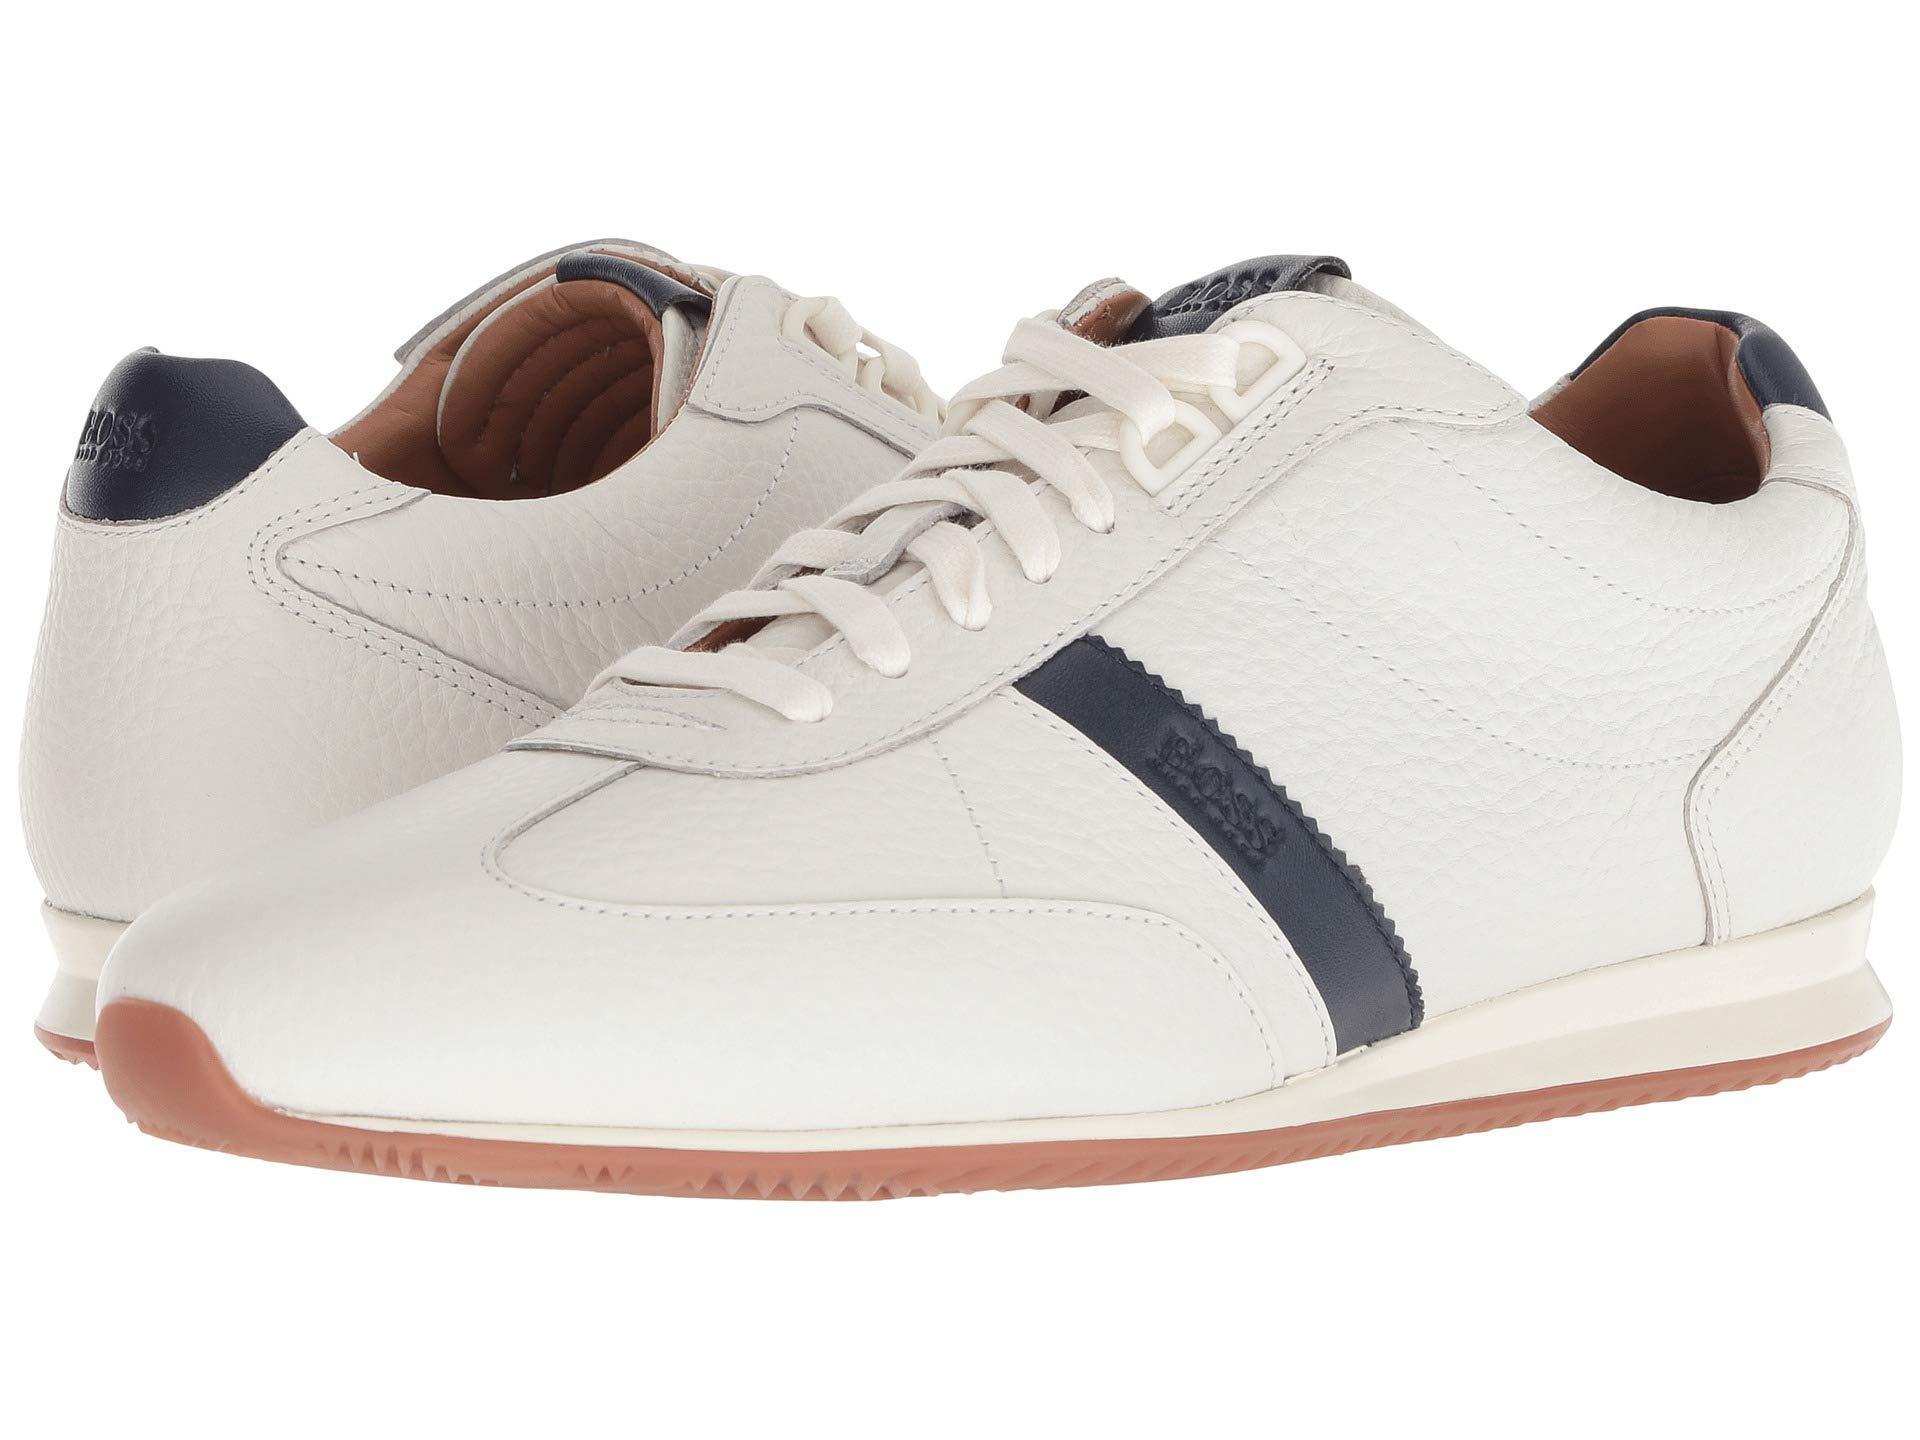 Hugo Boss Orland Retro Leather Sneaker